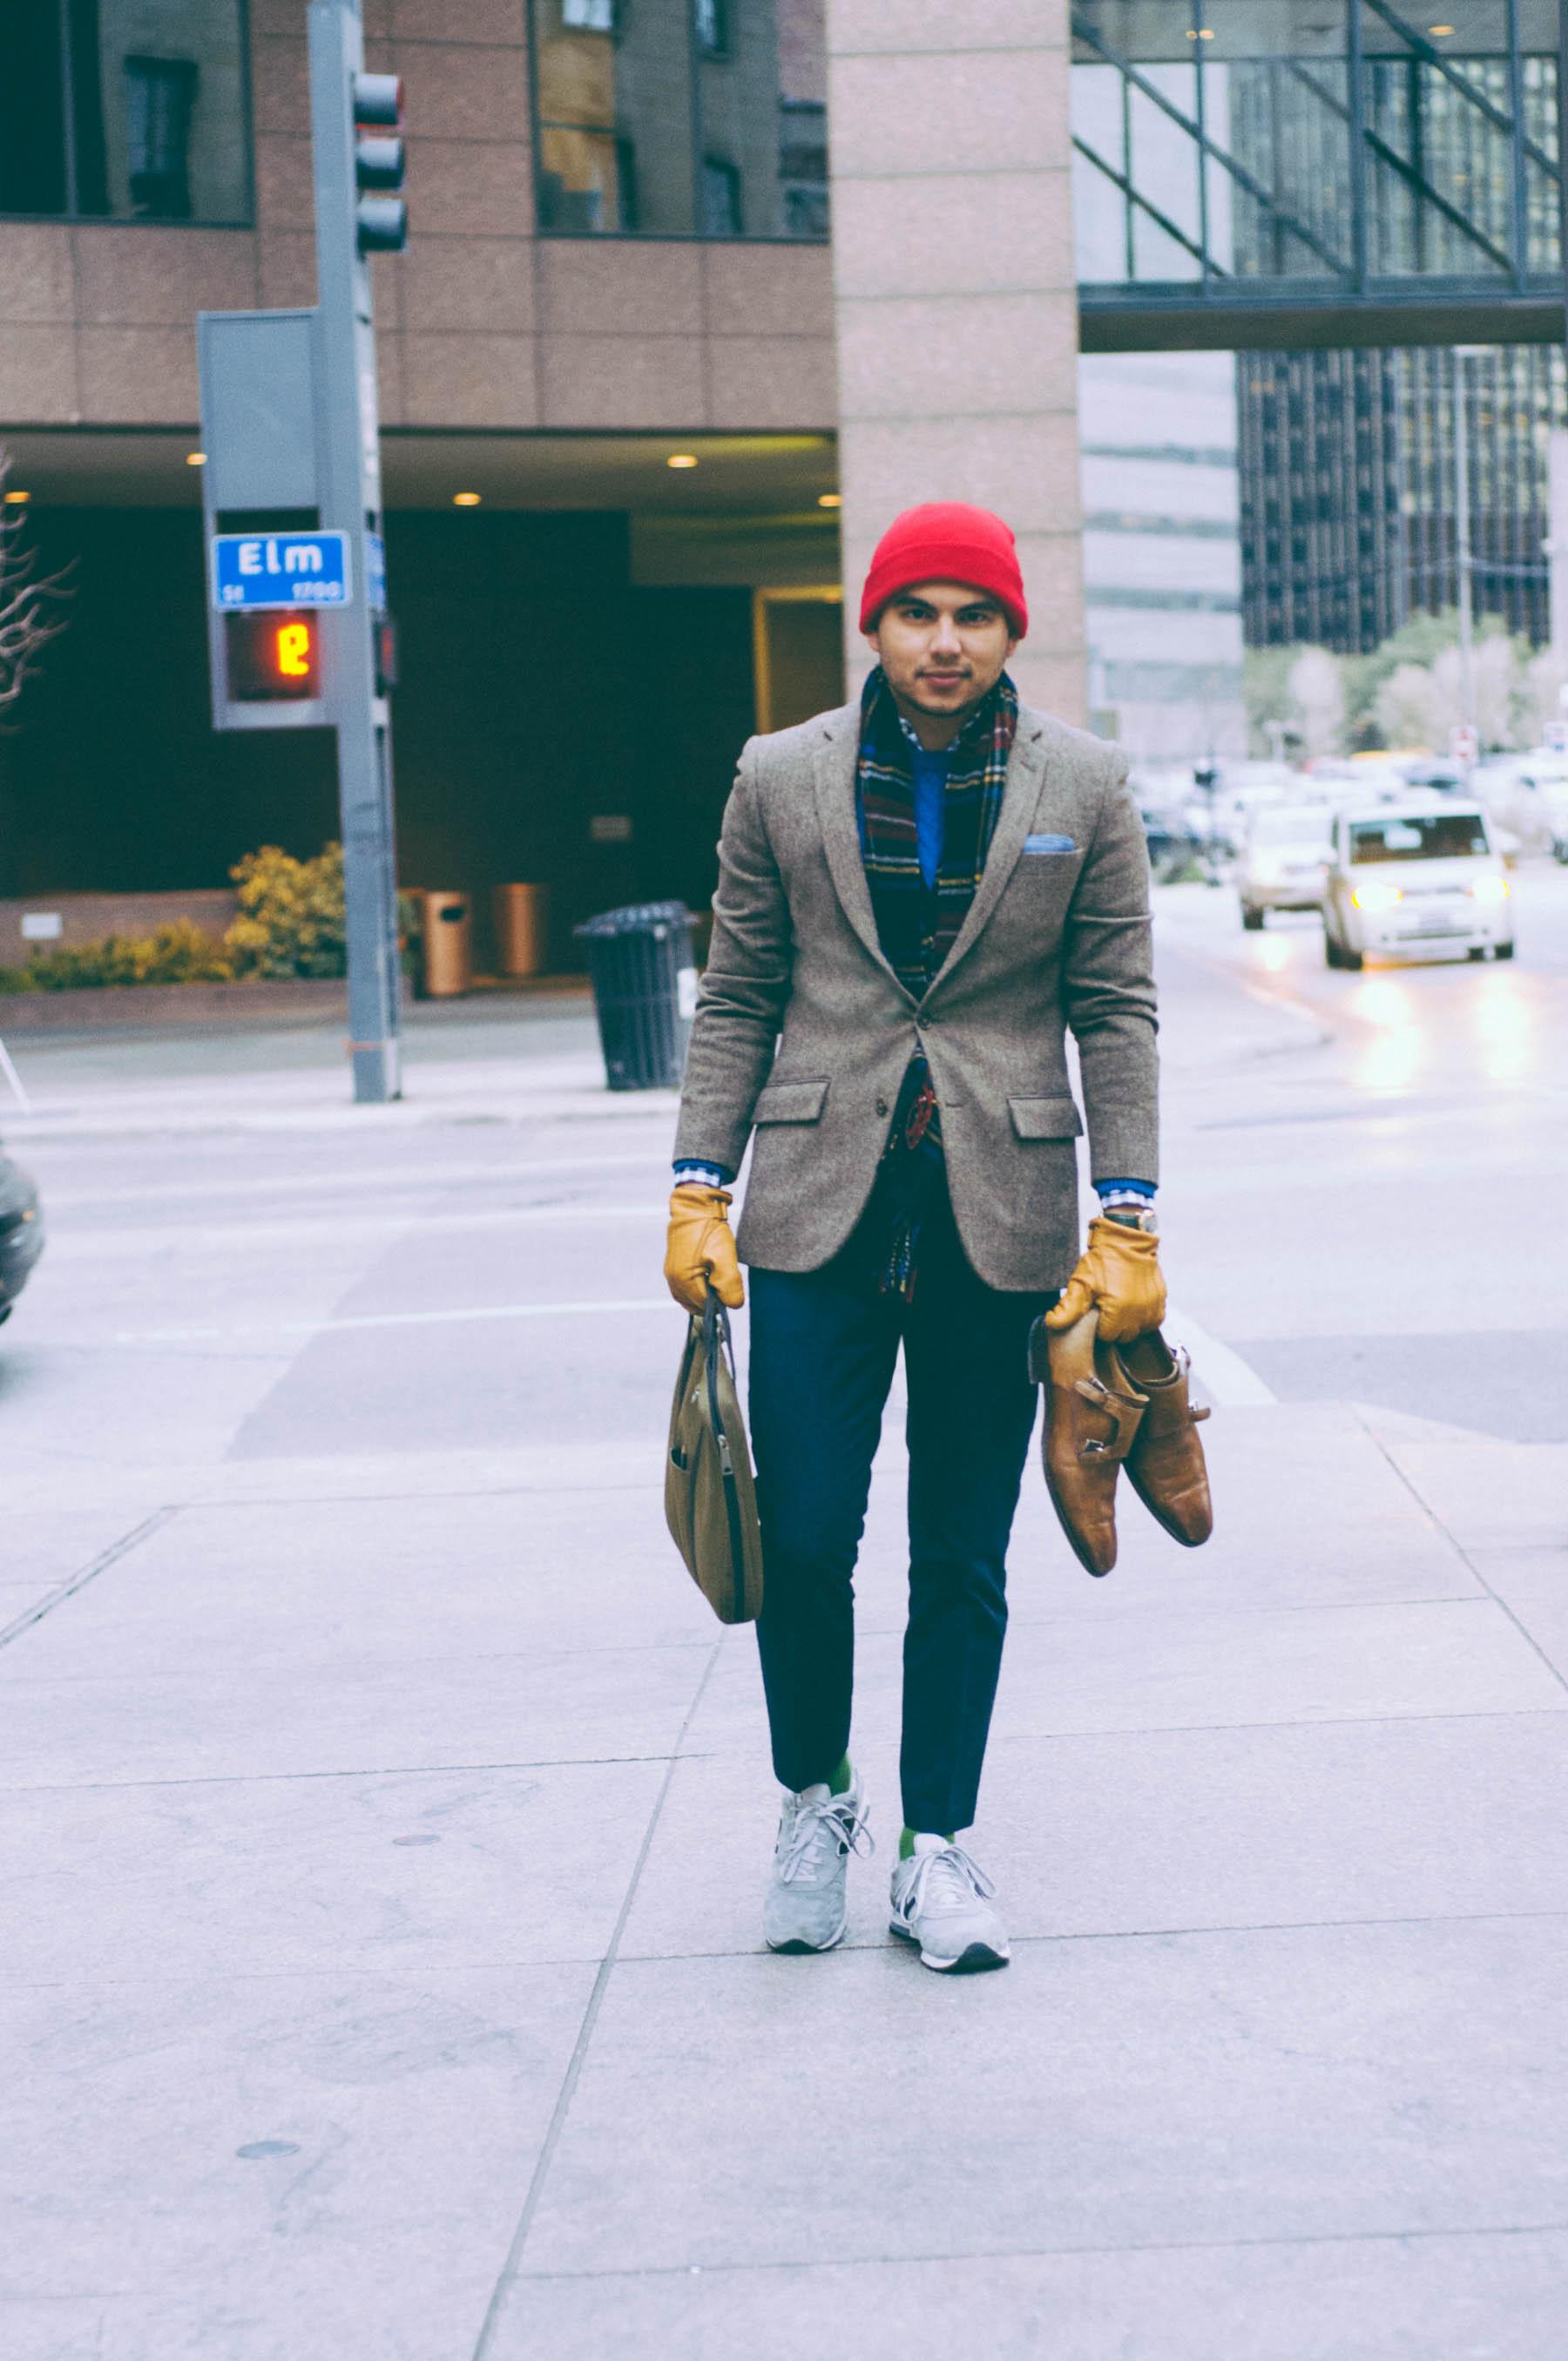 Blazer: J.Crew   Sweater: H&M (similar here)   Shirt: J.Crew   Pants: J.Crew   Shoes:  New Balance x J.Crew    Socks: J.Crew   Scarf: Polo Ralph Lauren   Shoes (in hand): Magnanni   Bag: Jack Spade   Beanie: similar here   Pocket Square: The Tie Bar   Gloves: Jack Spade   Watch: Shinola